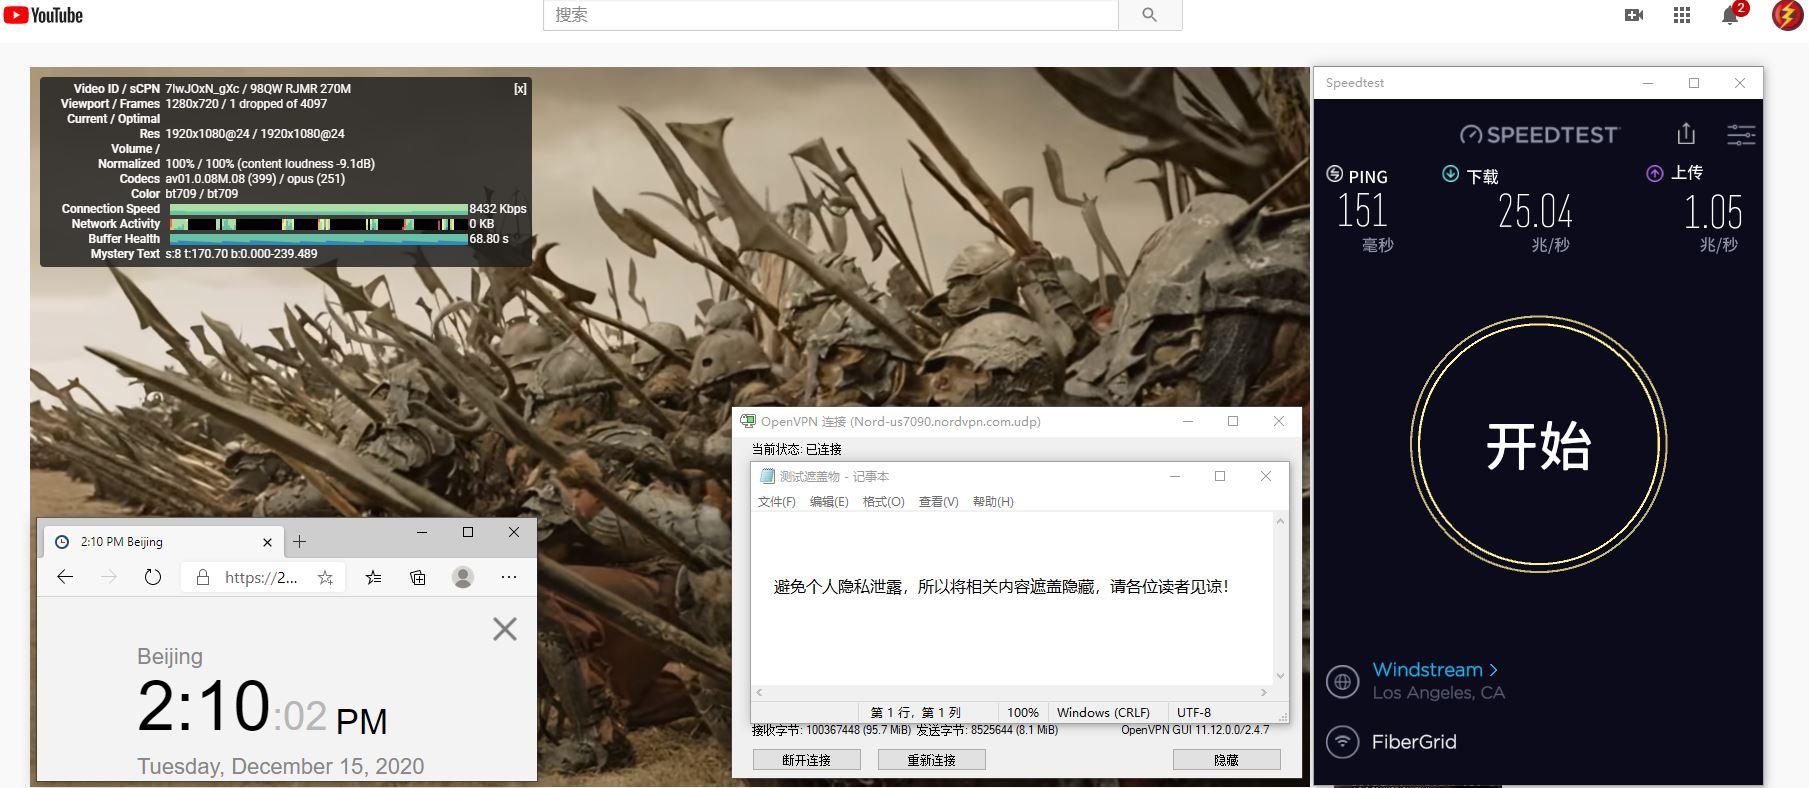 Windows10 NordVPN OpenVPN Gui US7090 服务器 中国VPN 翻墙 科学上网 测试 - 20201215